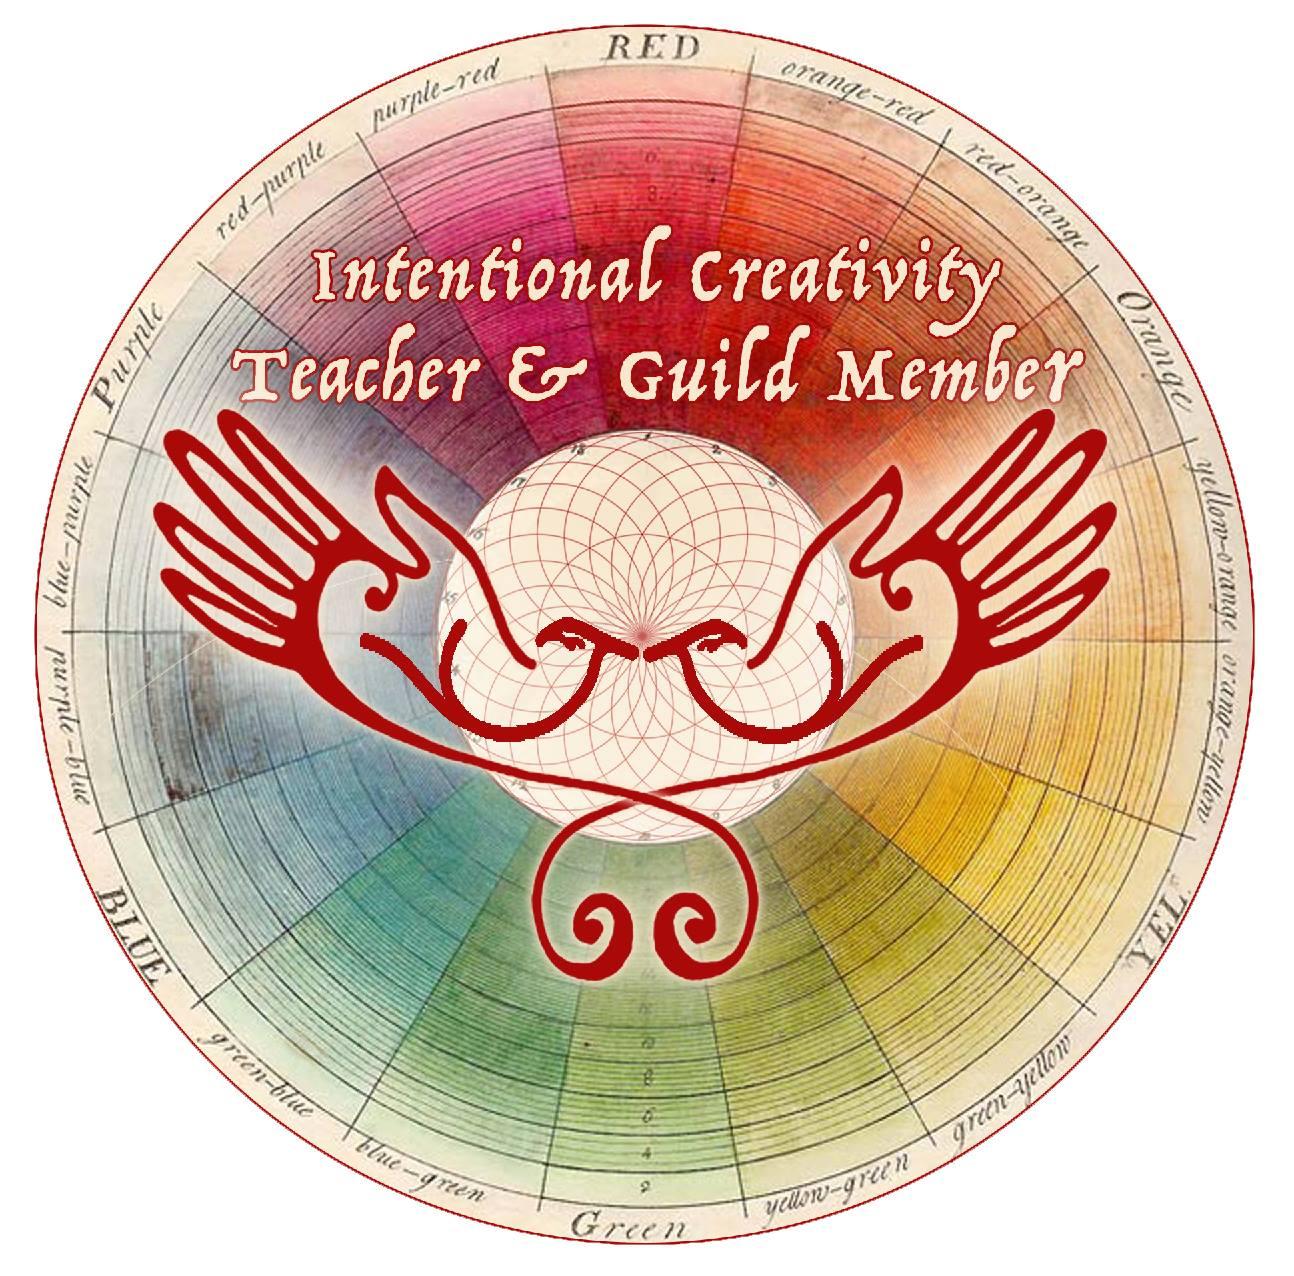 IC_Guild_Badge.jpg